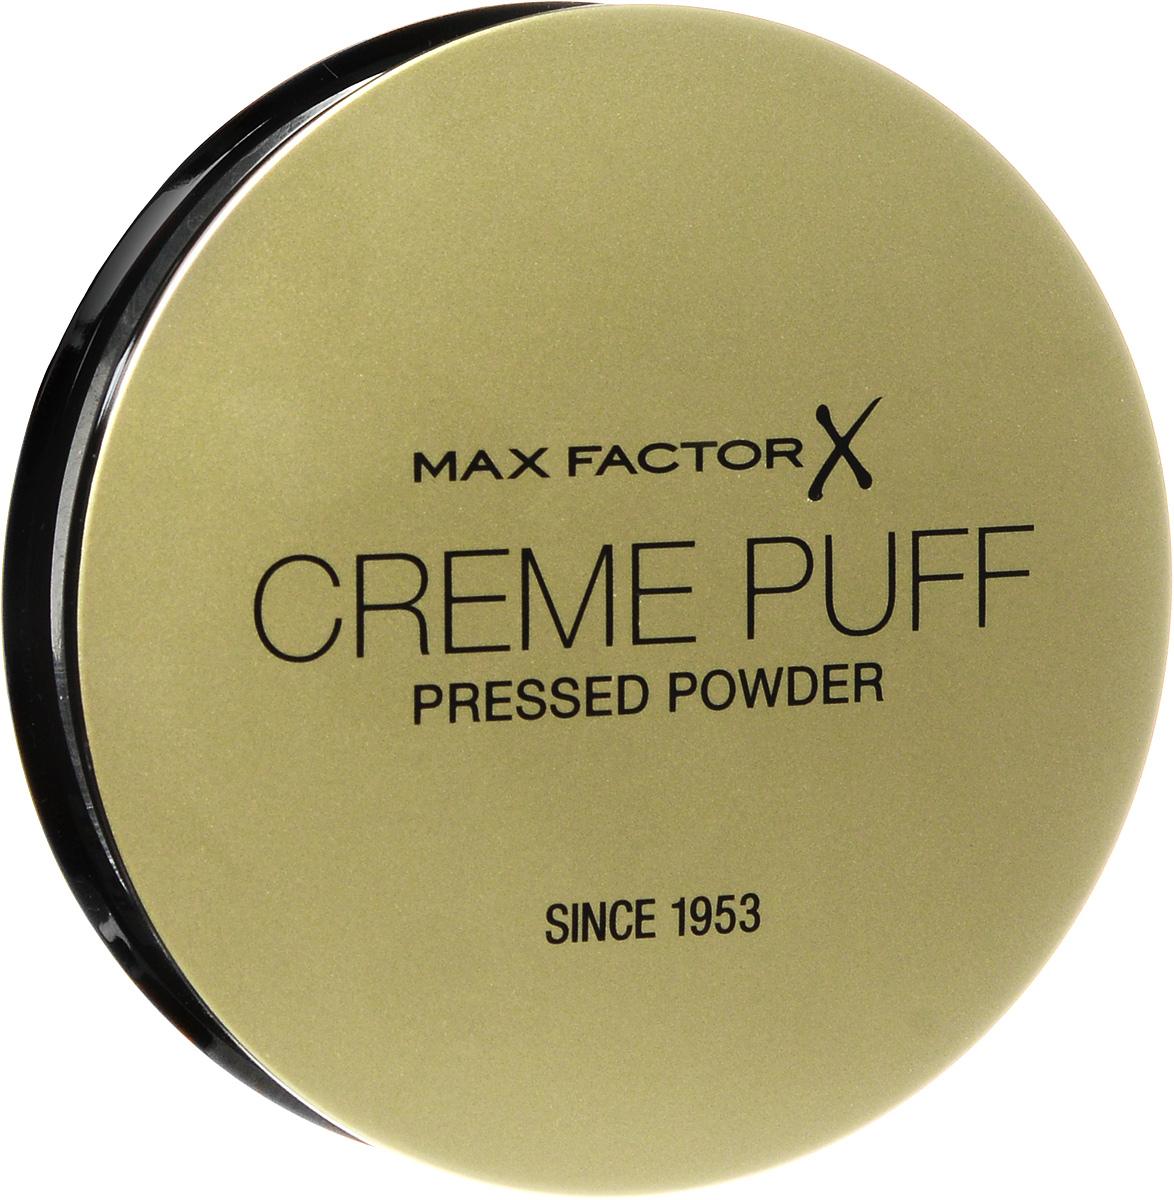 Max Factor Крем-пудра Тональная Creme Puff Powder 05 тон translucent, 15 мл